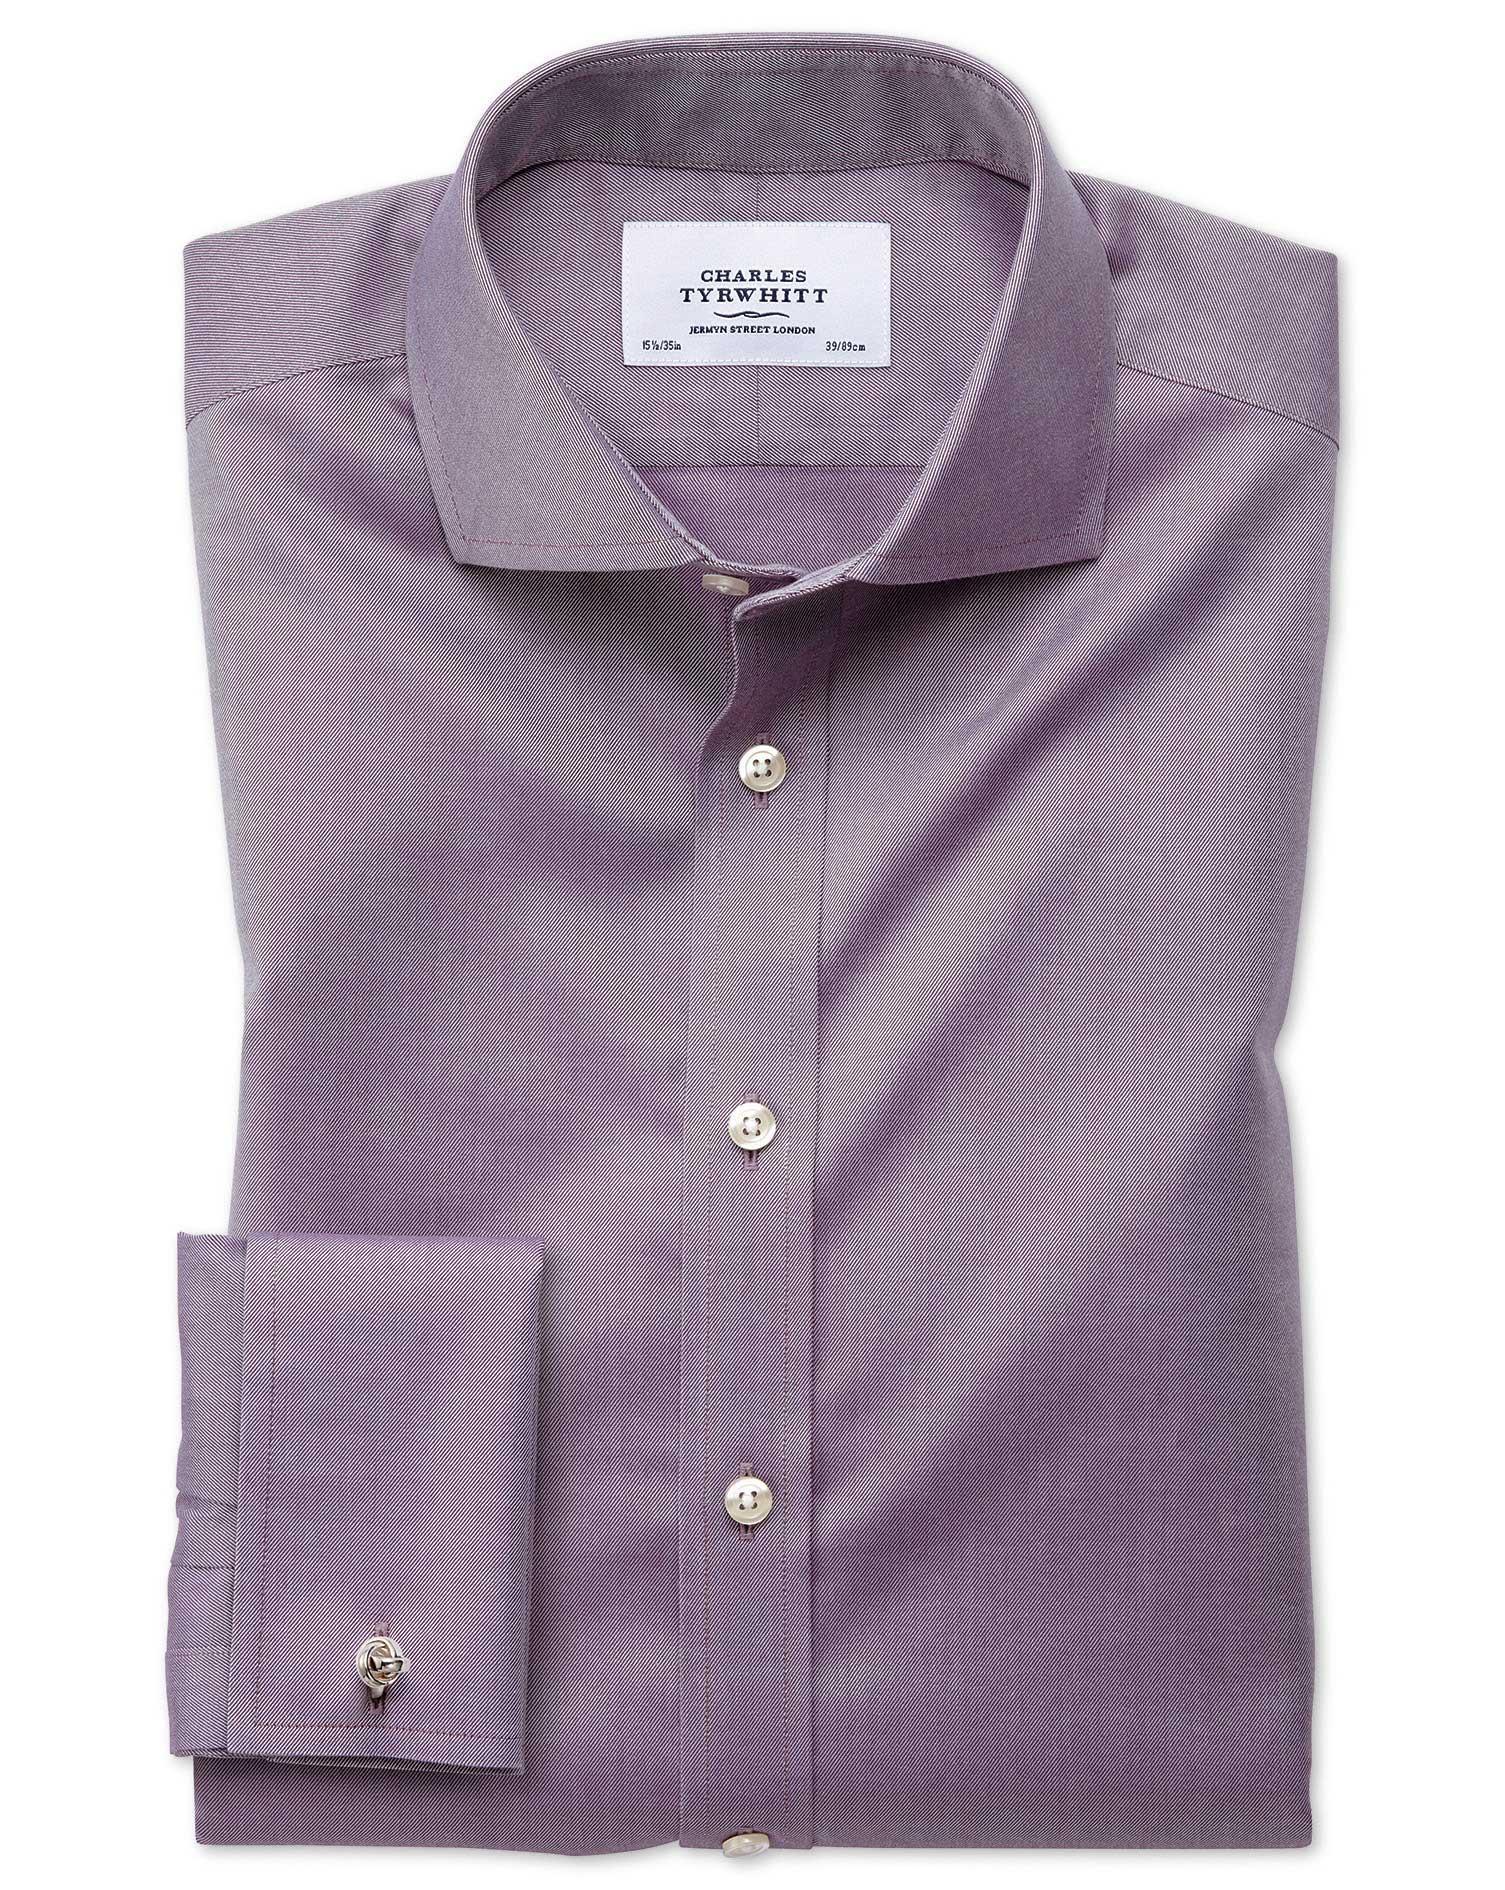 Extra Slim Fit Cutaway Non-Iron Twill Dark Purple Cotton Formal Shirt Single Cuff Size 16/34 by Char